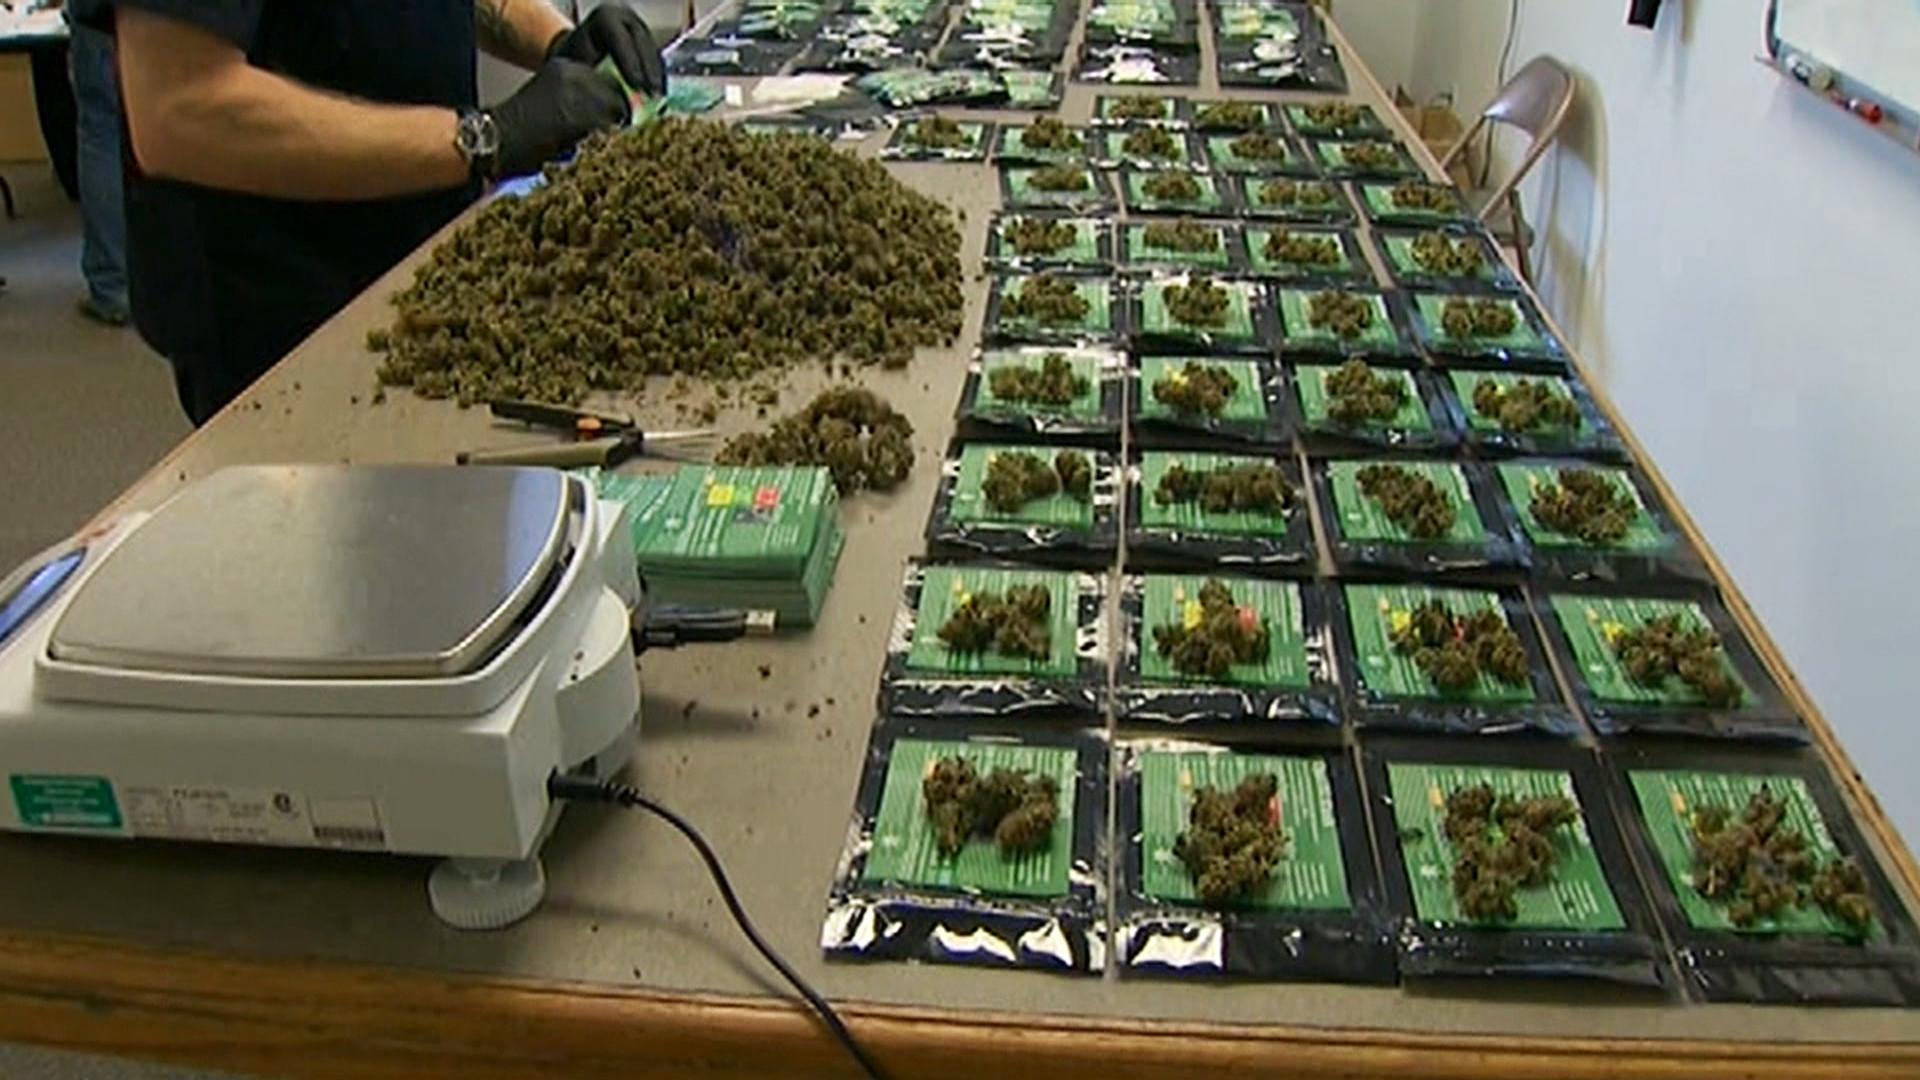 Washington State's First Legal Marijuana Shops Set to Open Amid Chaos